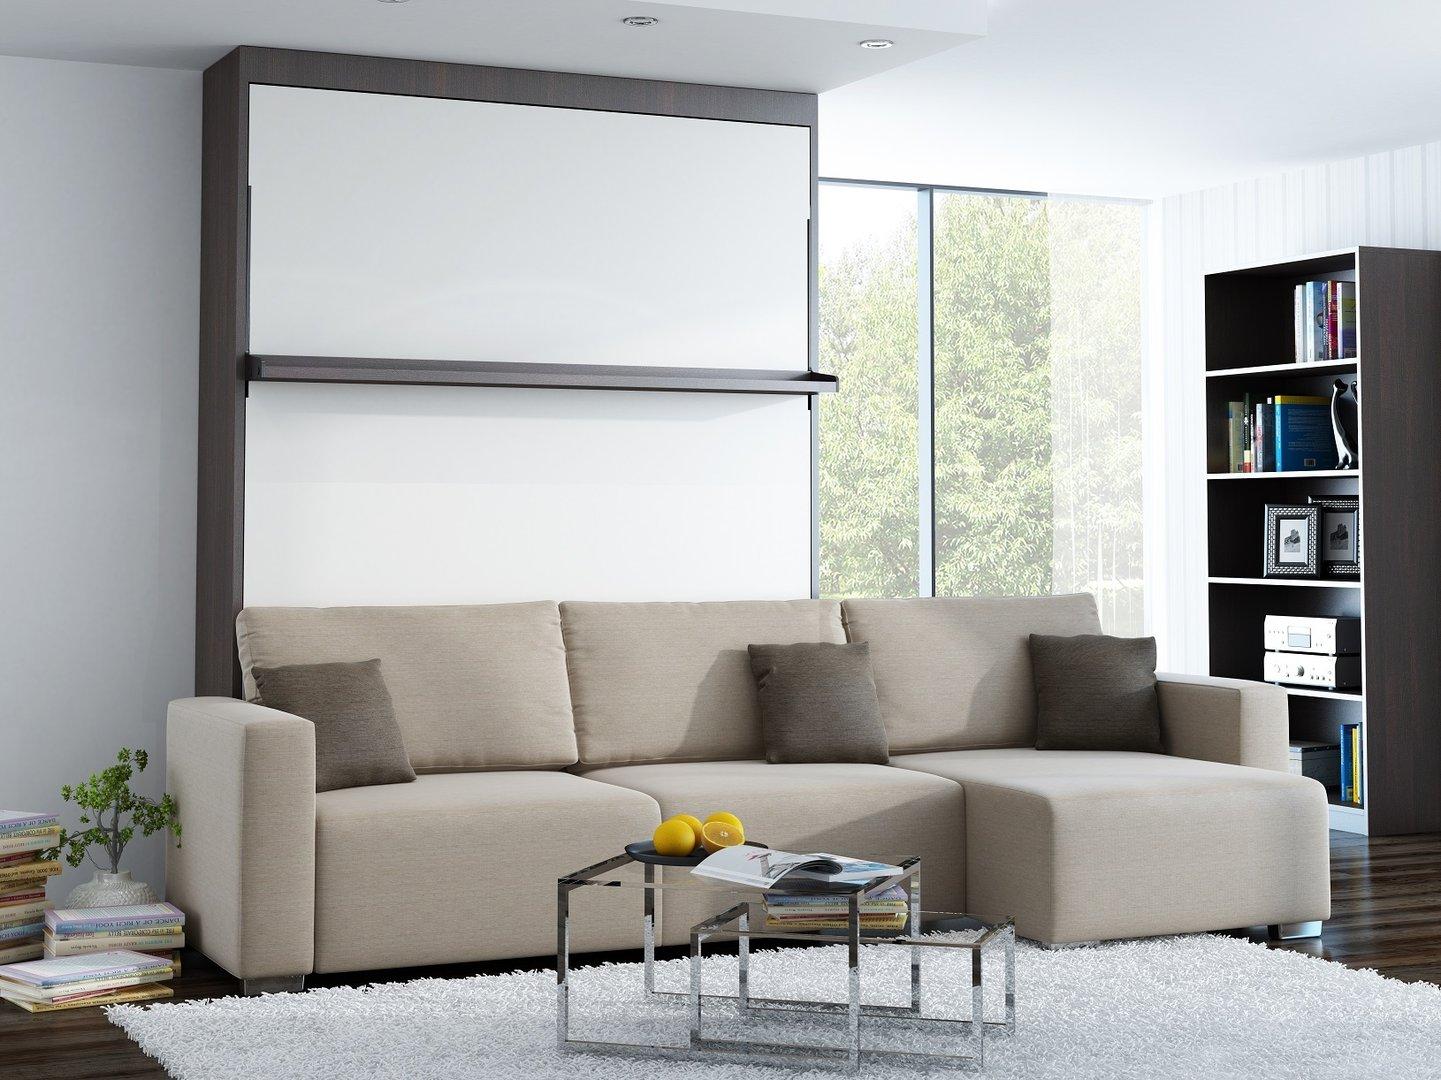 Faszinierend Sofa Ecke Ideen Von Wandbett Mit Leggio Linea Lw 140 X